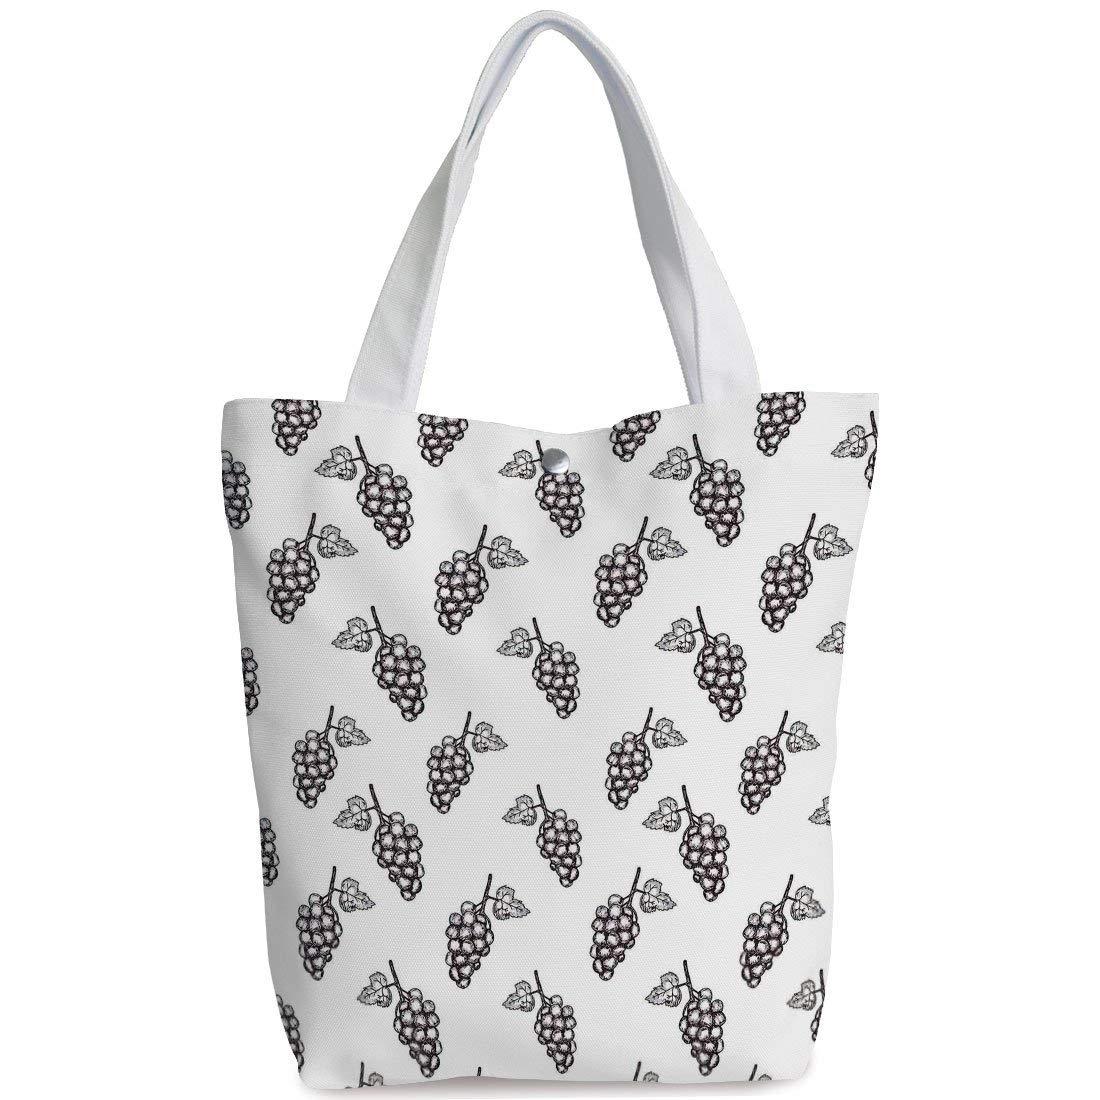 b15bc30286 Get Quotations · iPrint Canvas Shopping bag